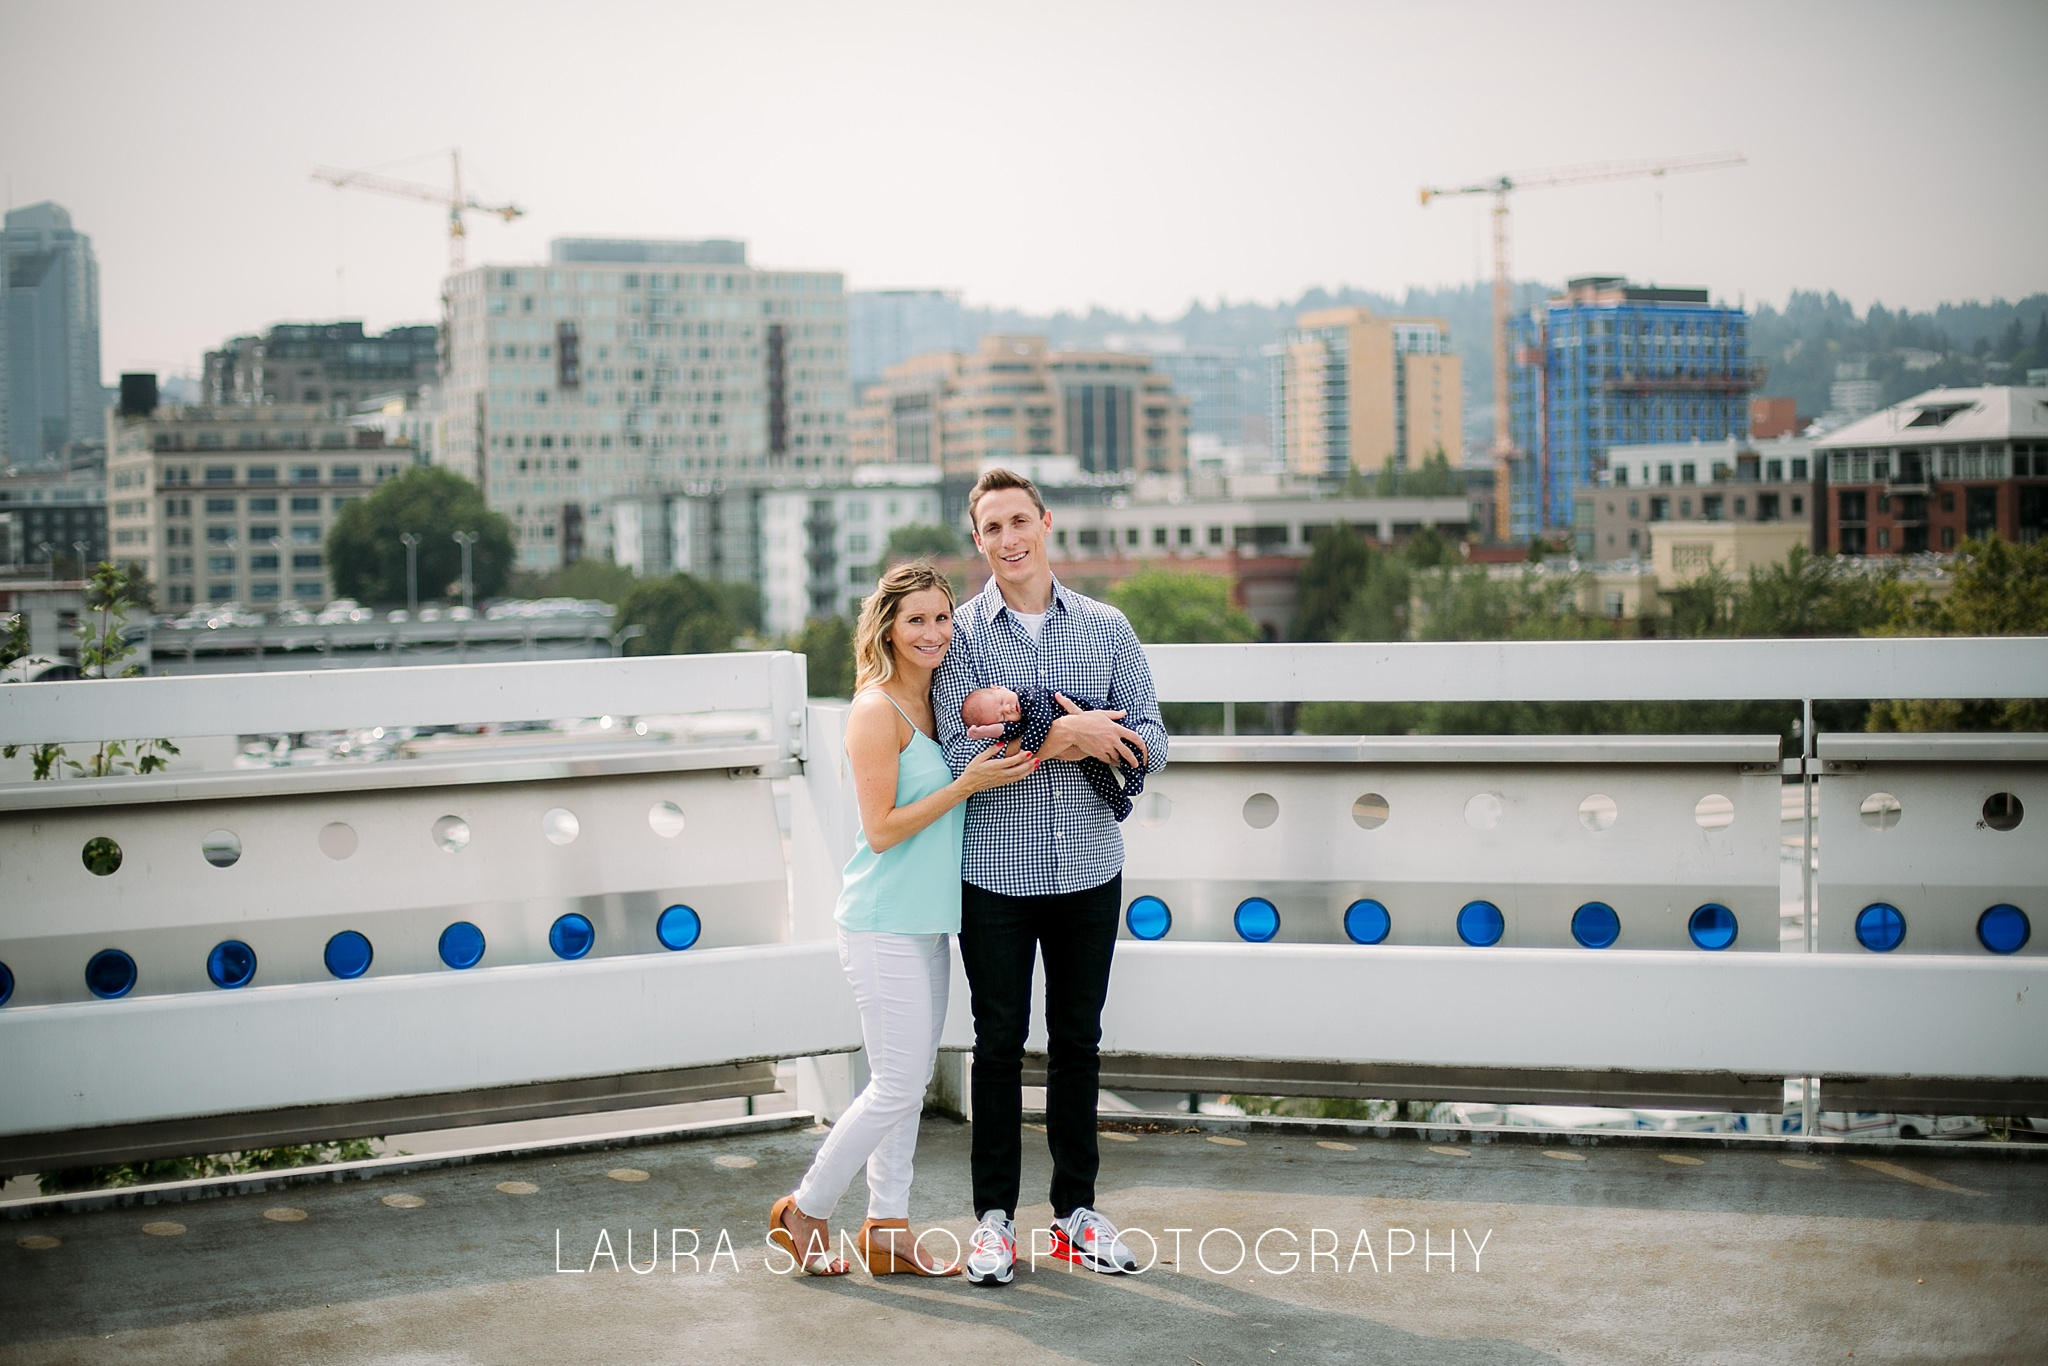 Laura Santos Photography Portland Oregon Family Photographer_0282.jpg